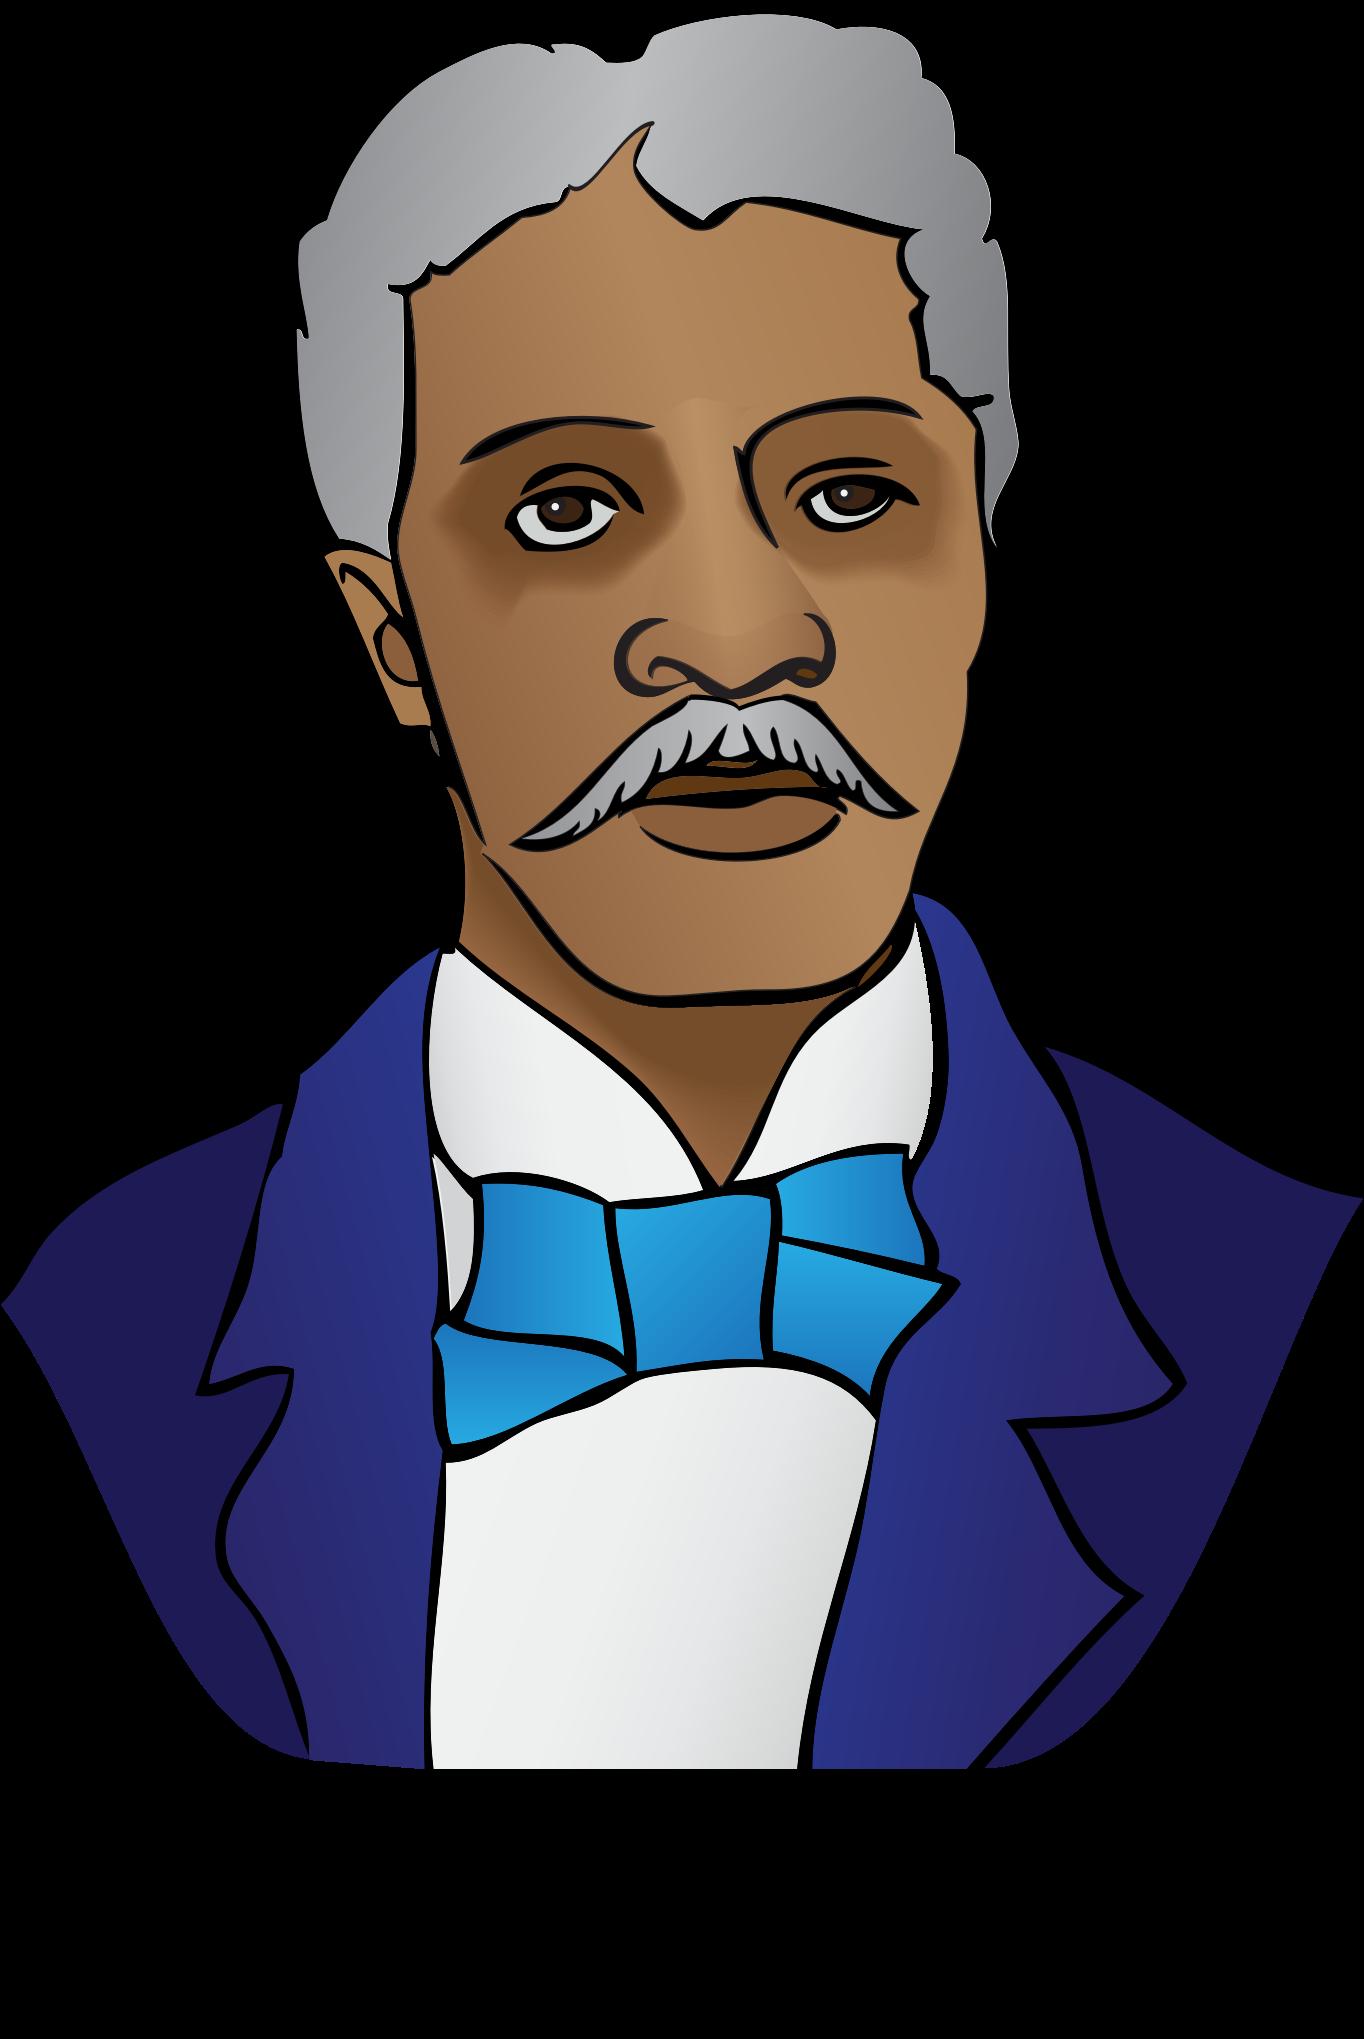 Head clipart george washington Washington George George Carver Clipart